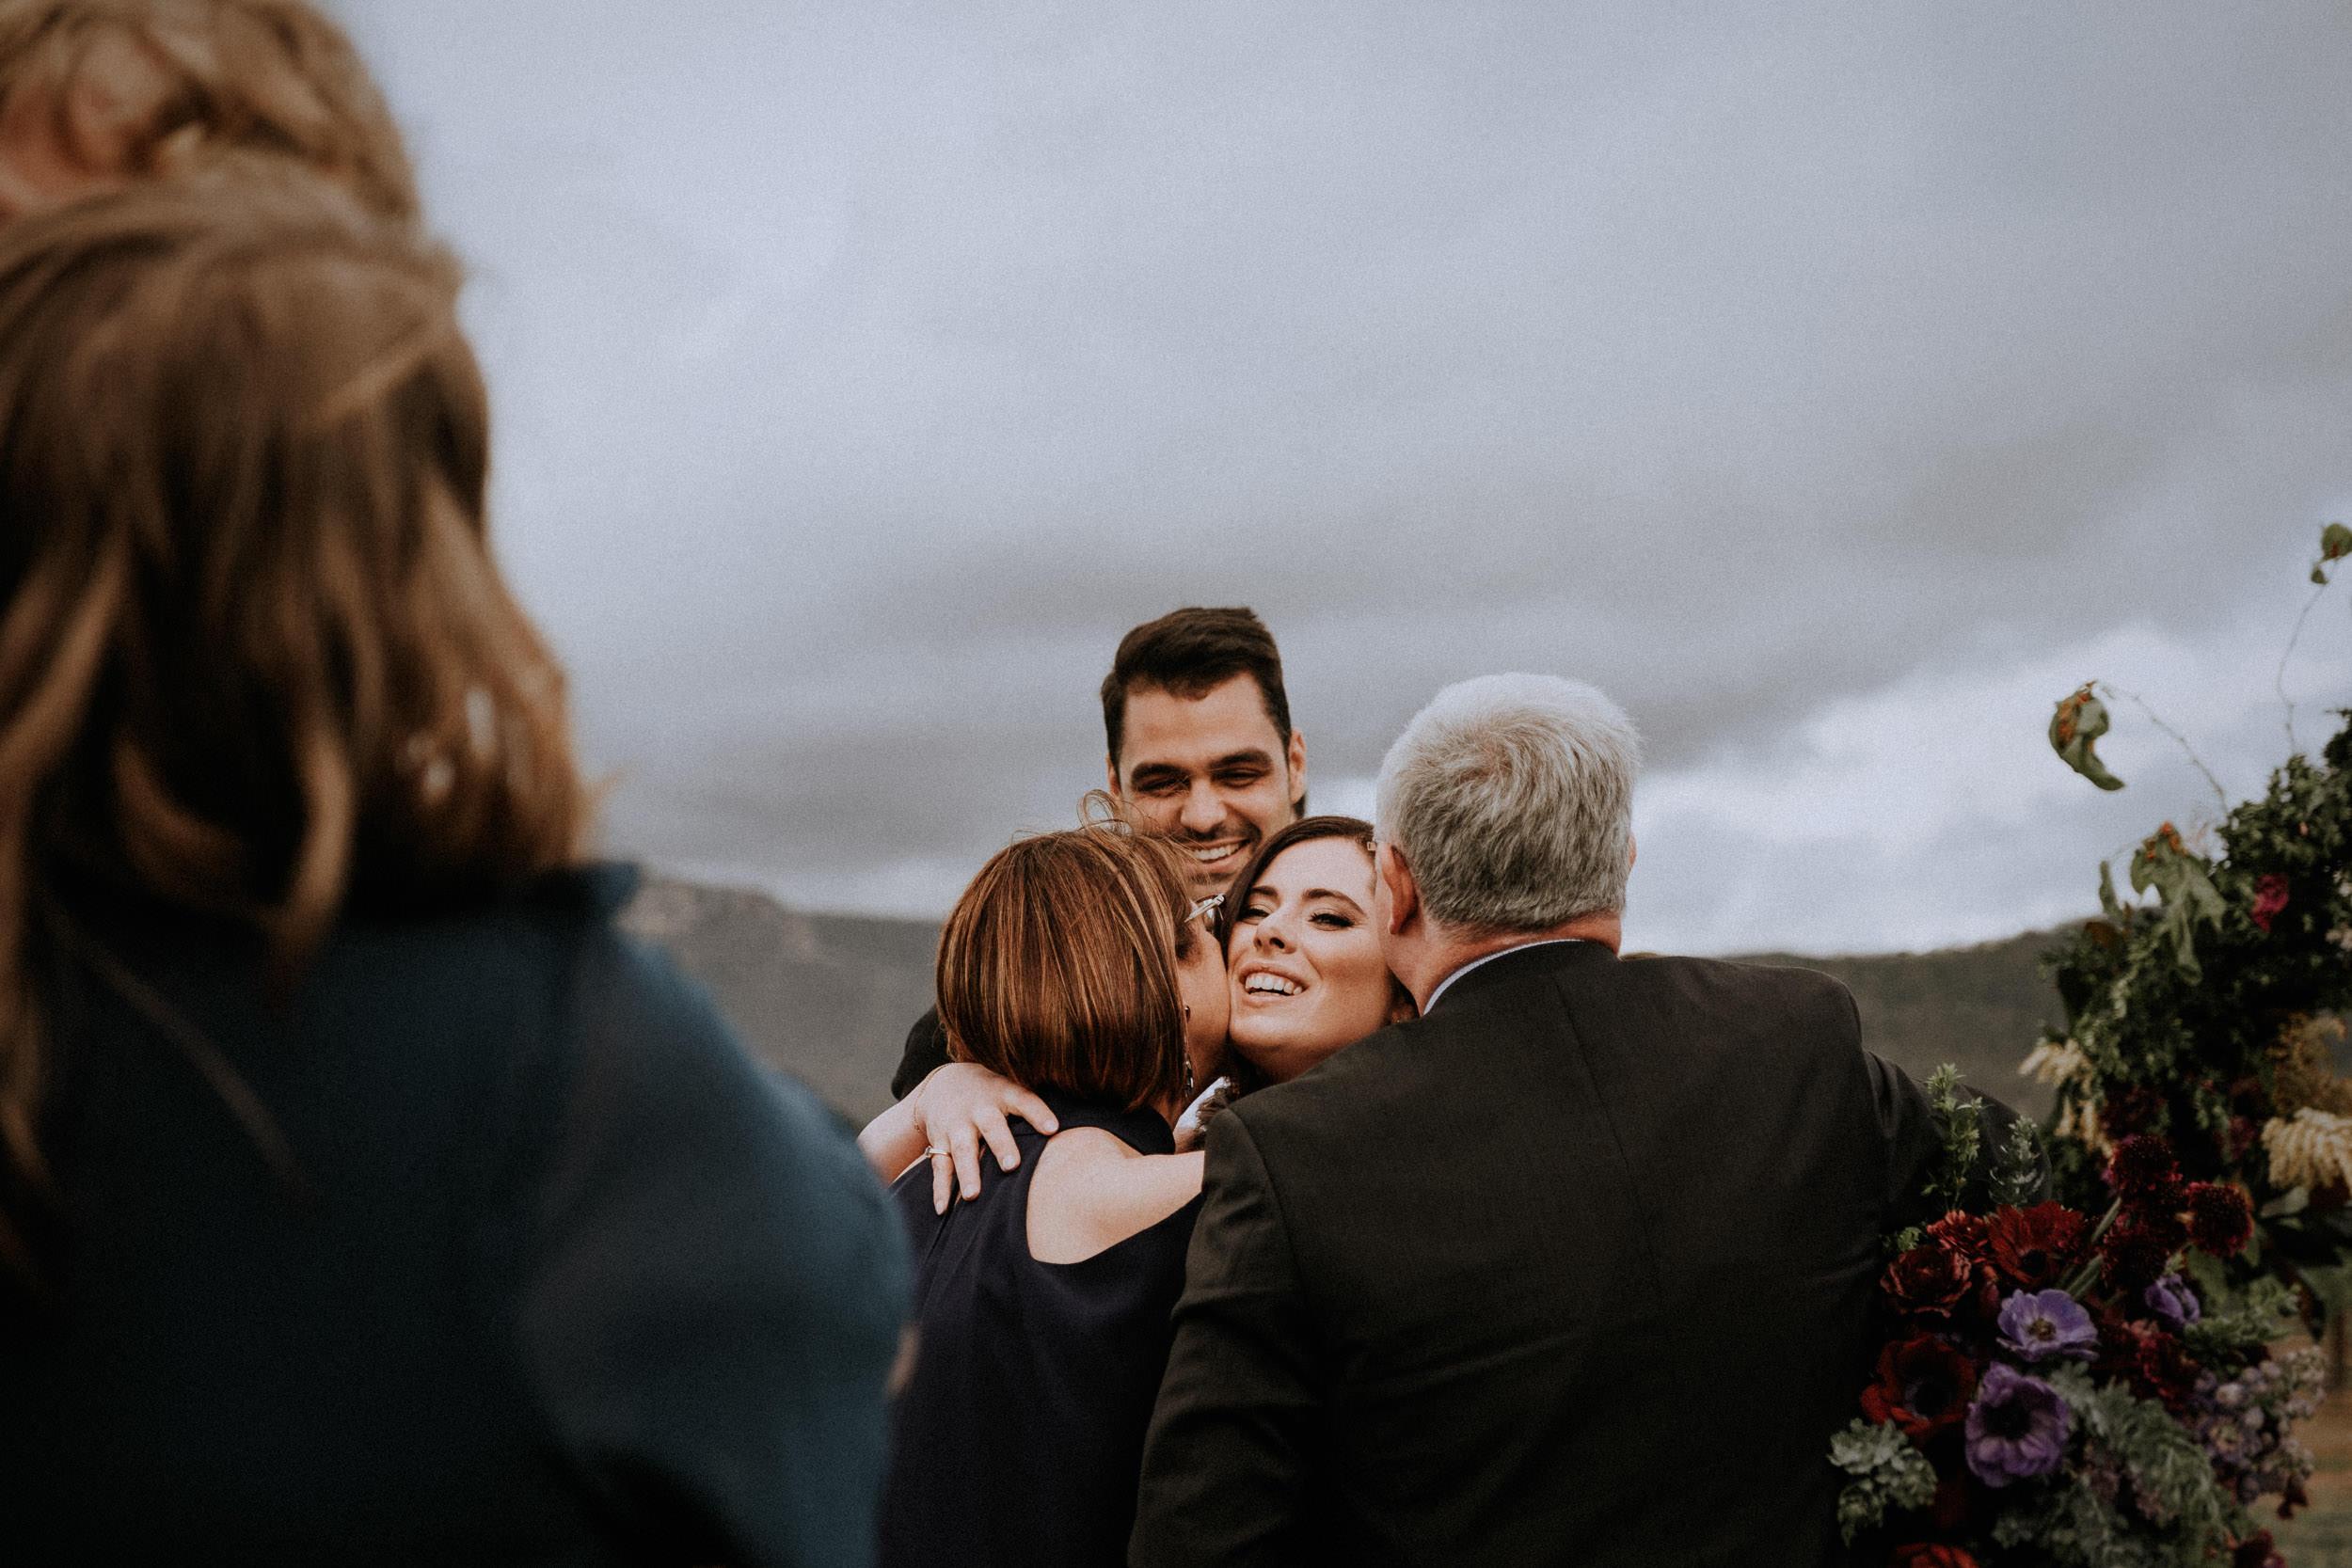 s+j_top_elopement wedding photography_kings & thieves_blog - 328.jpg